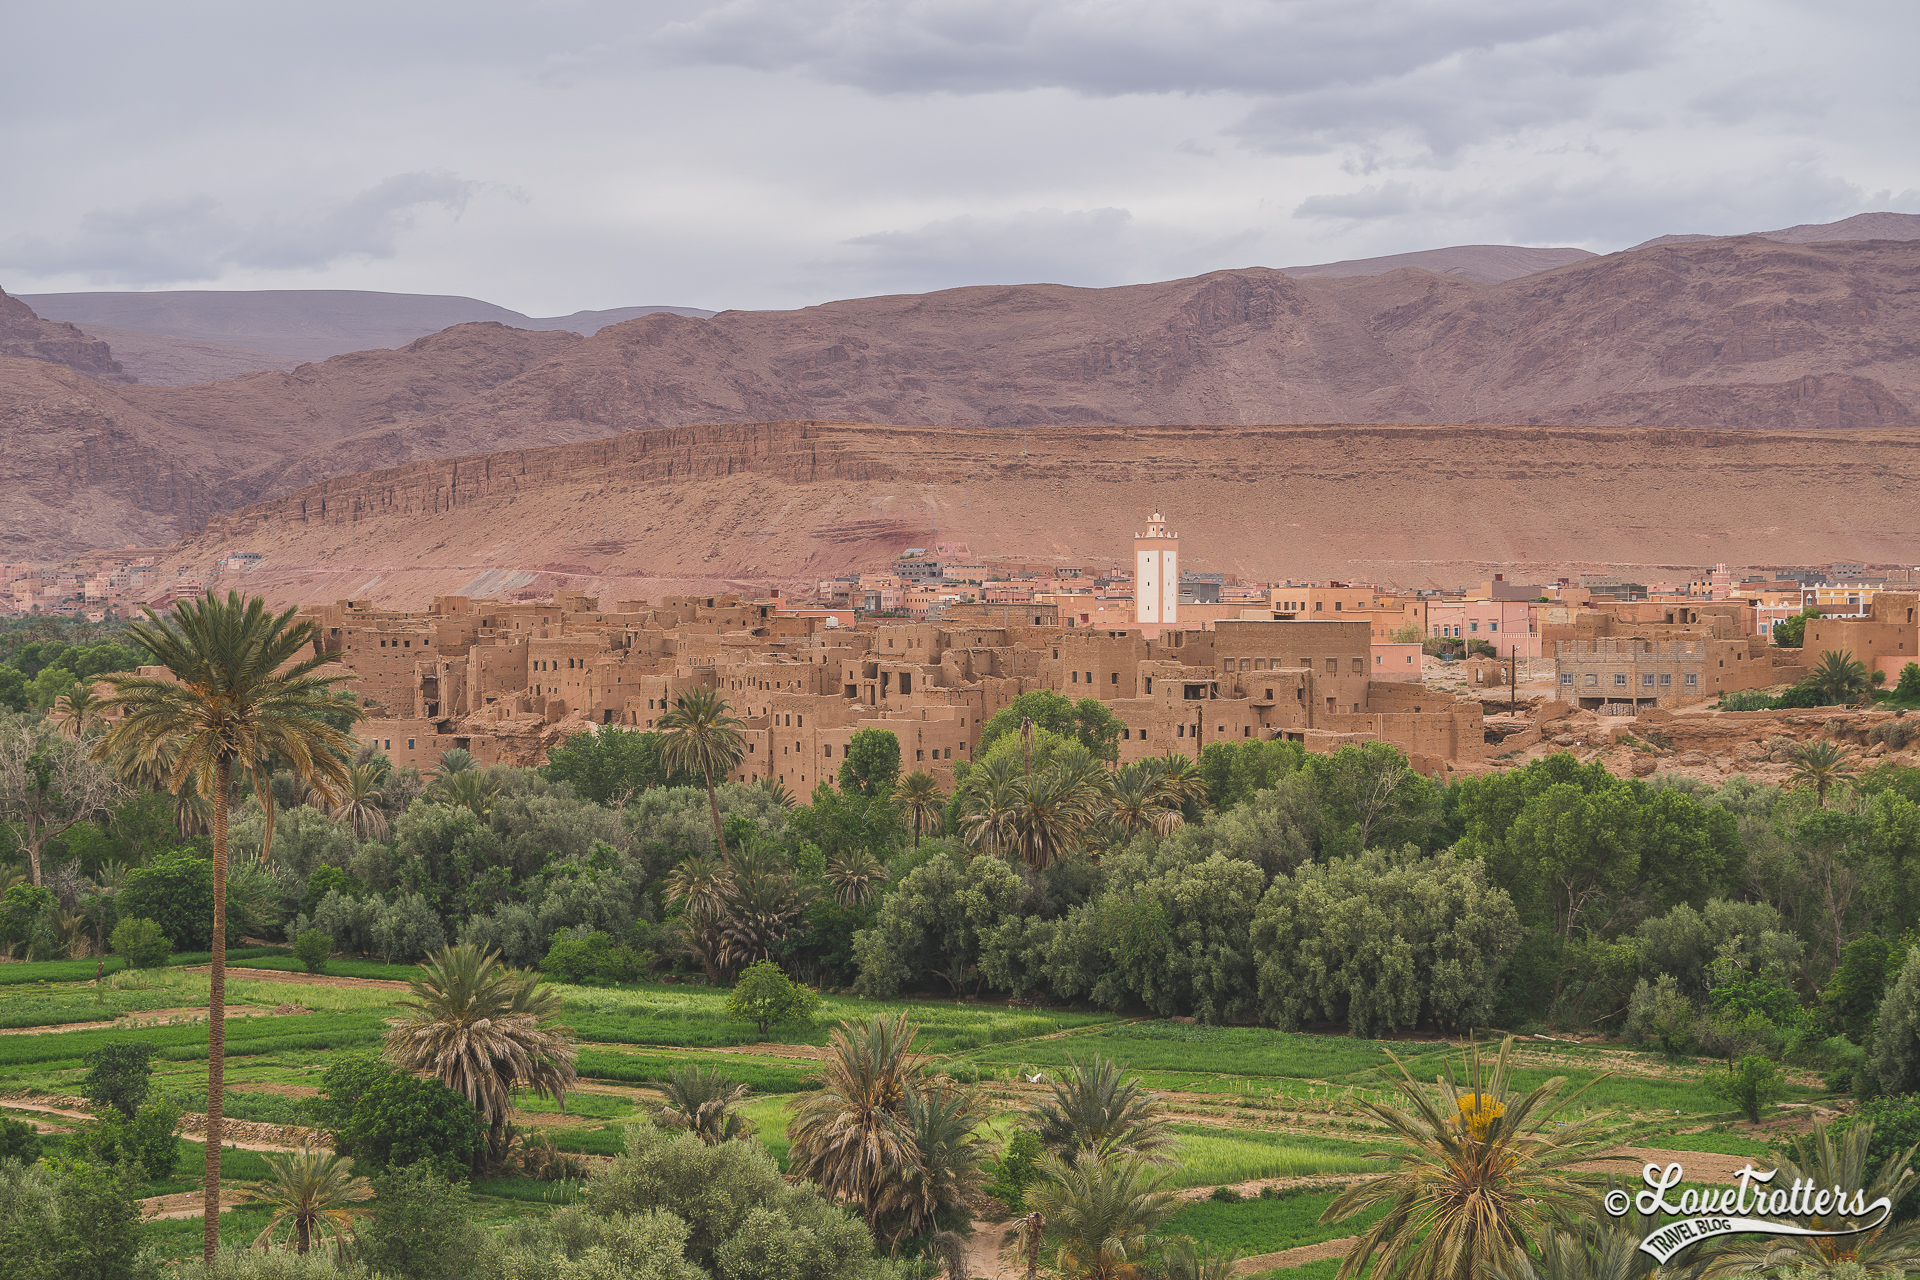 Roadtrip de Marrakech à Merzouga - Vallée du Dadès